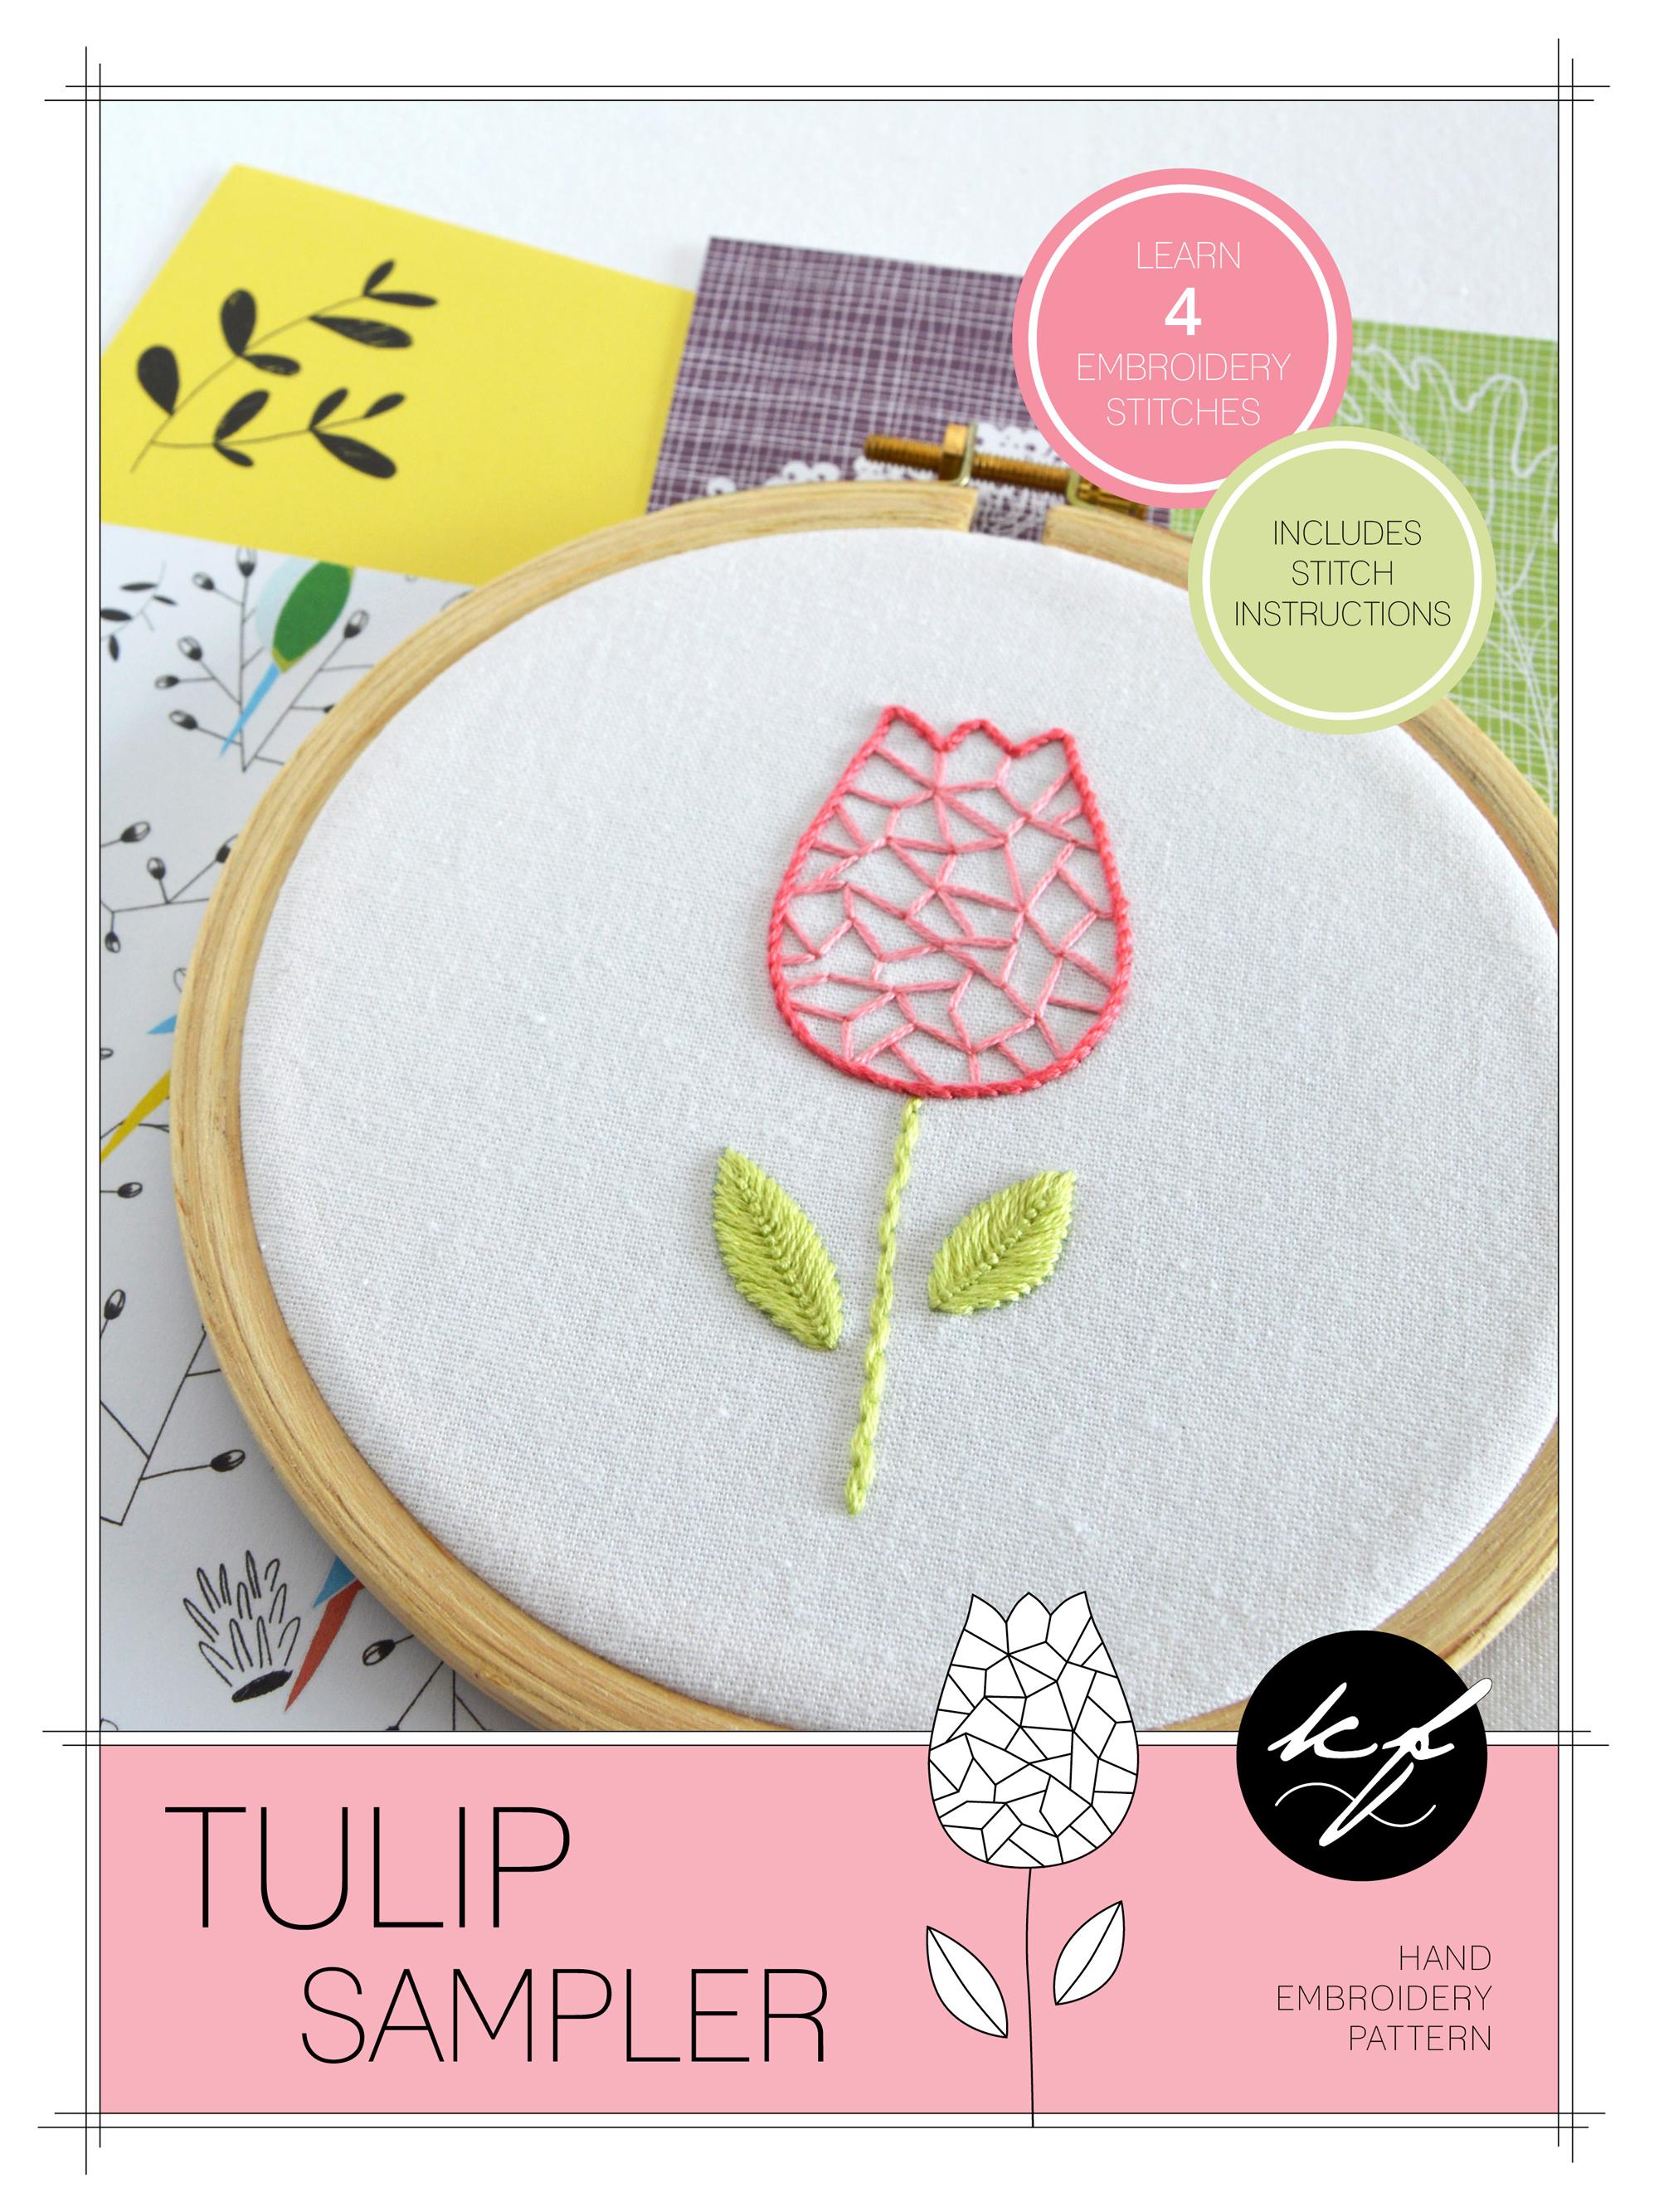 TulipSamplerEmbroideryPattern_KellyFletcher.jpg